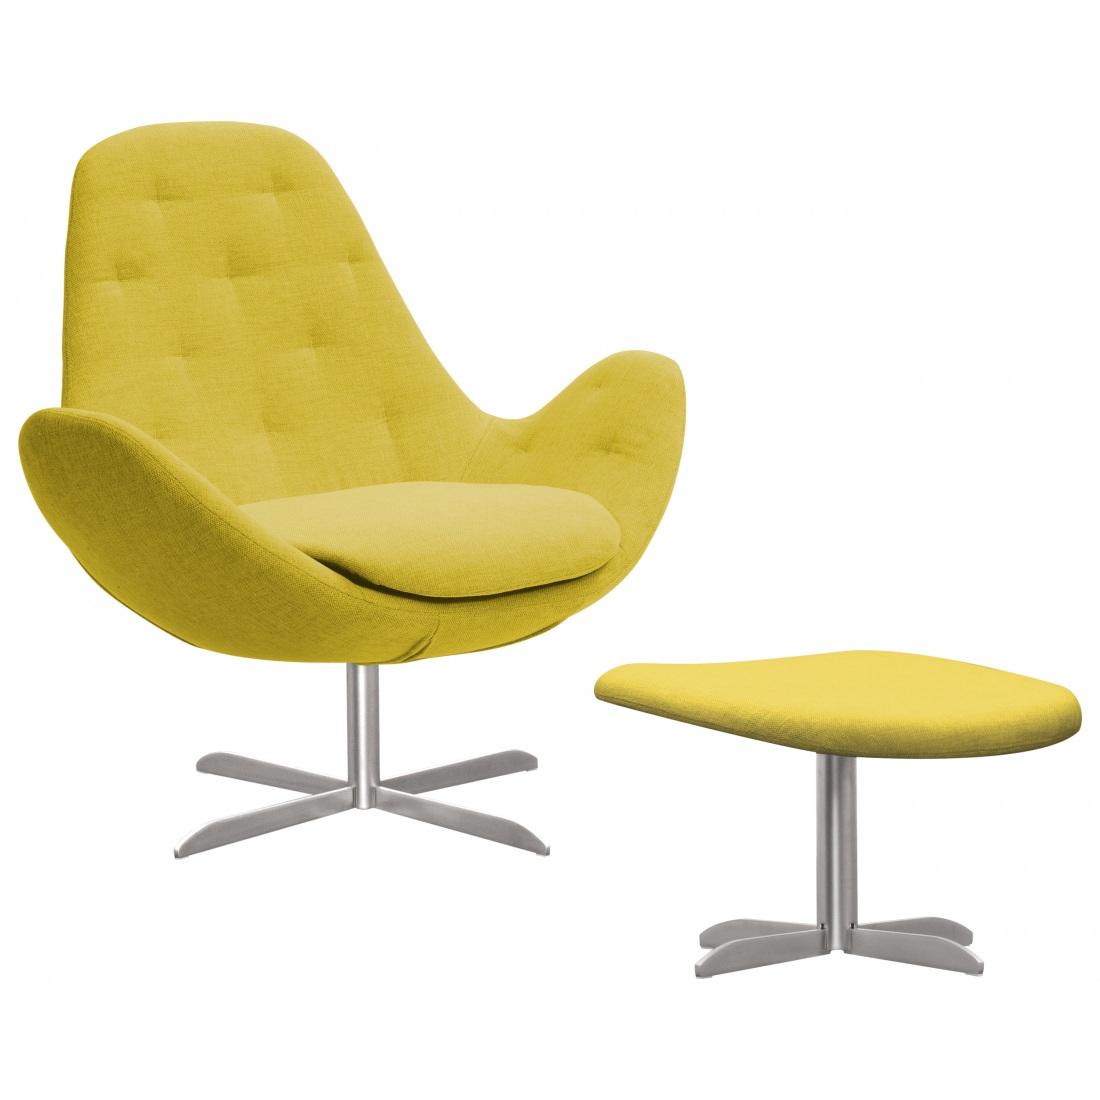 Sessel Mit Hocker Gelb Moebel Liebecom